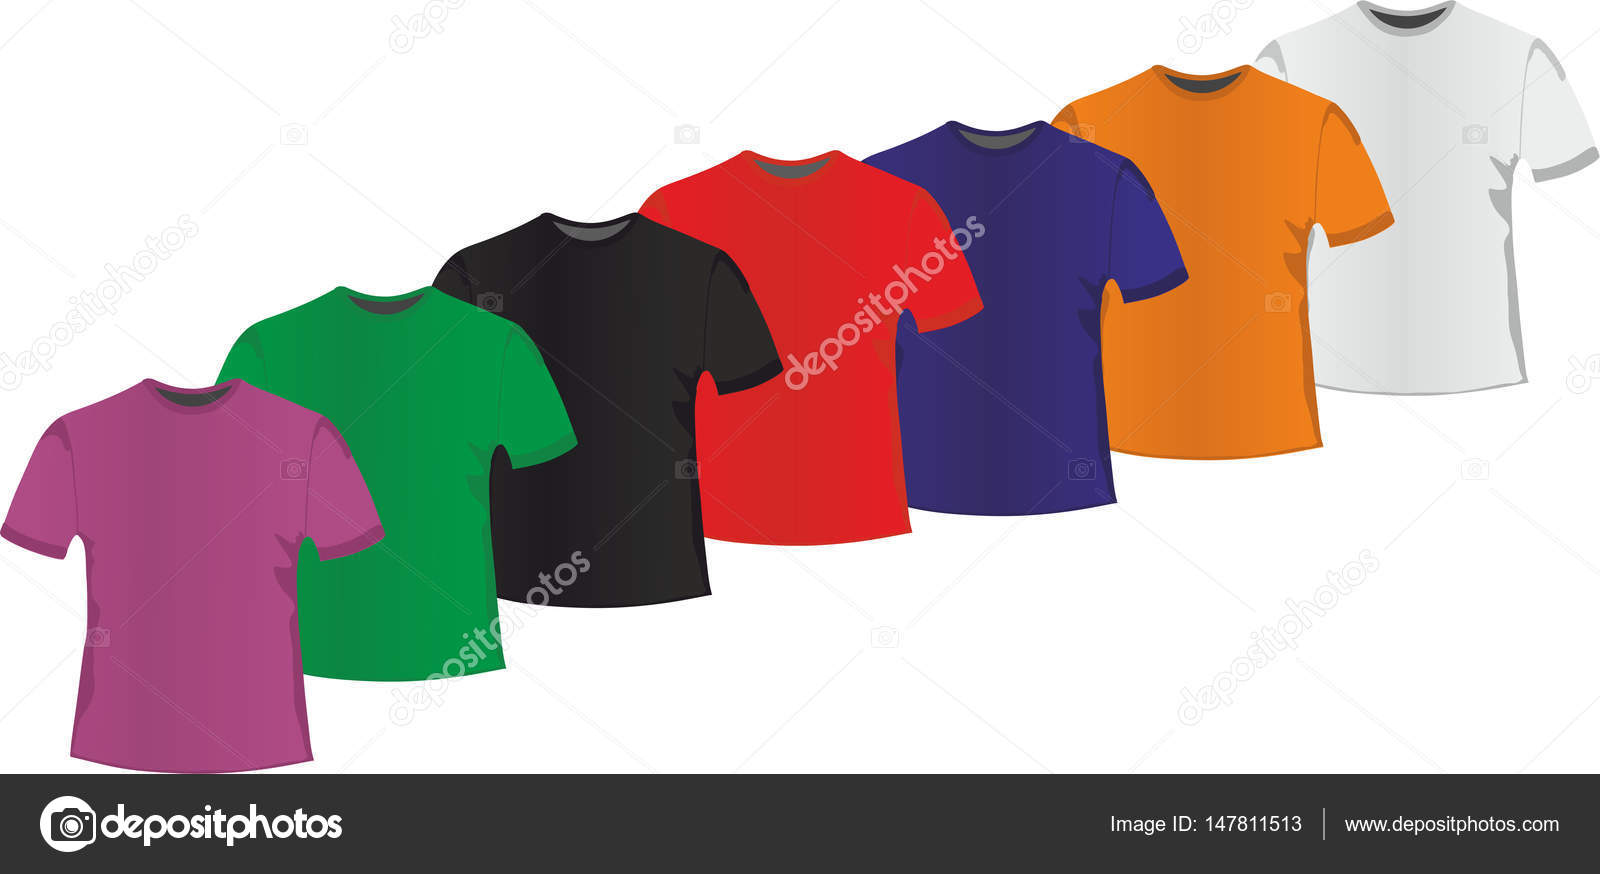 a9d35e324dca μια σειρά από Ανδρικά μπλουζάκια — Διανυσματικό Αρχείο ...